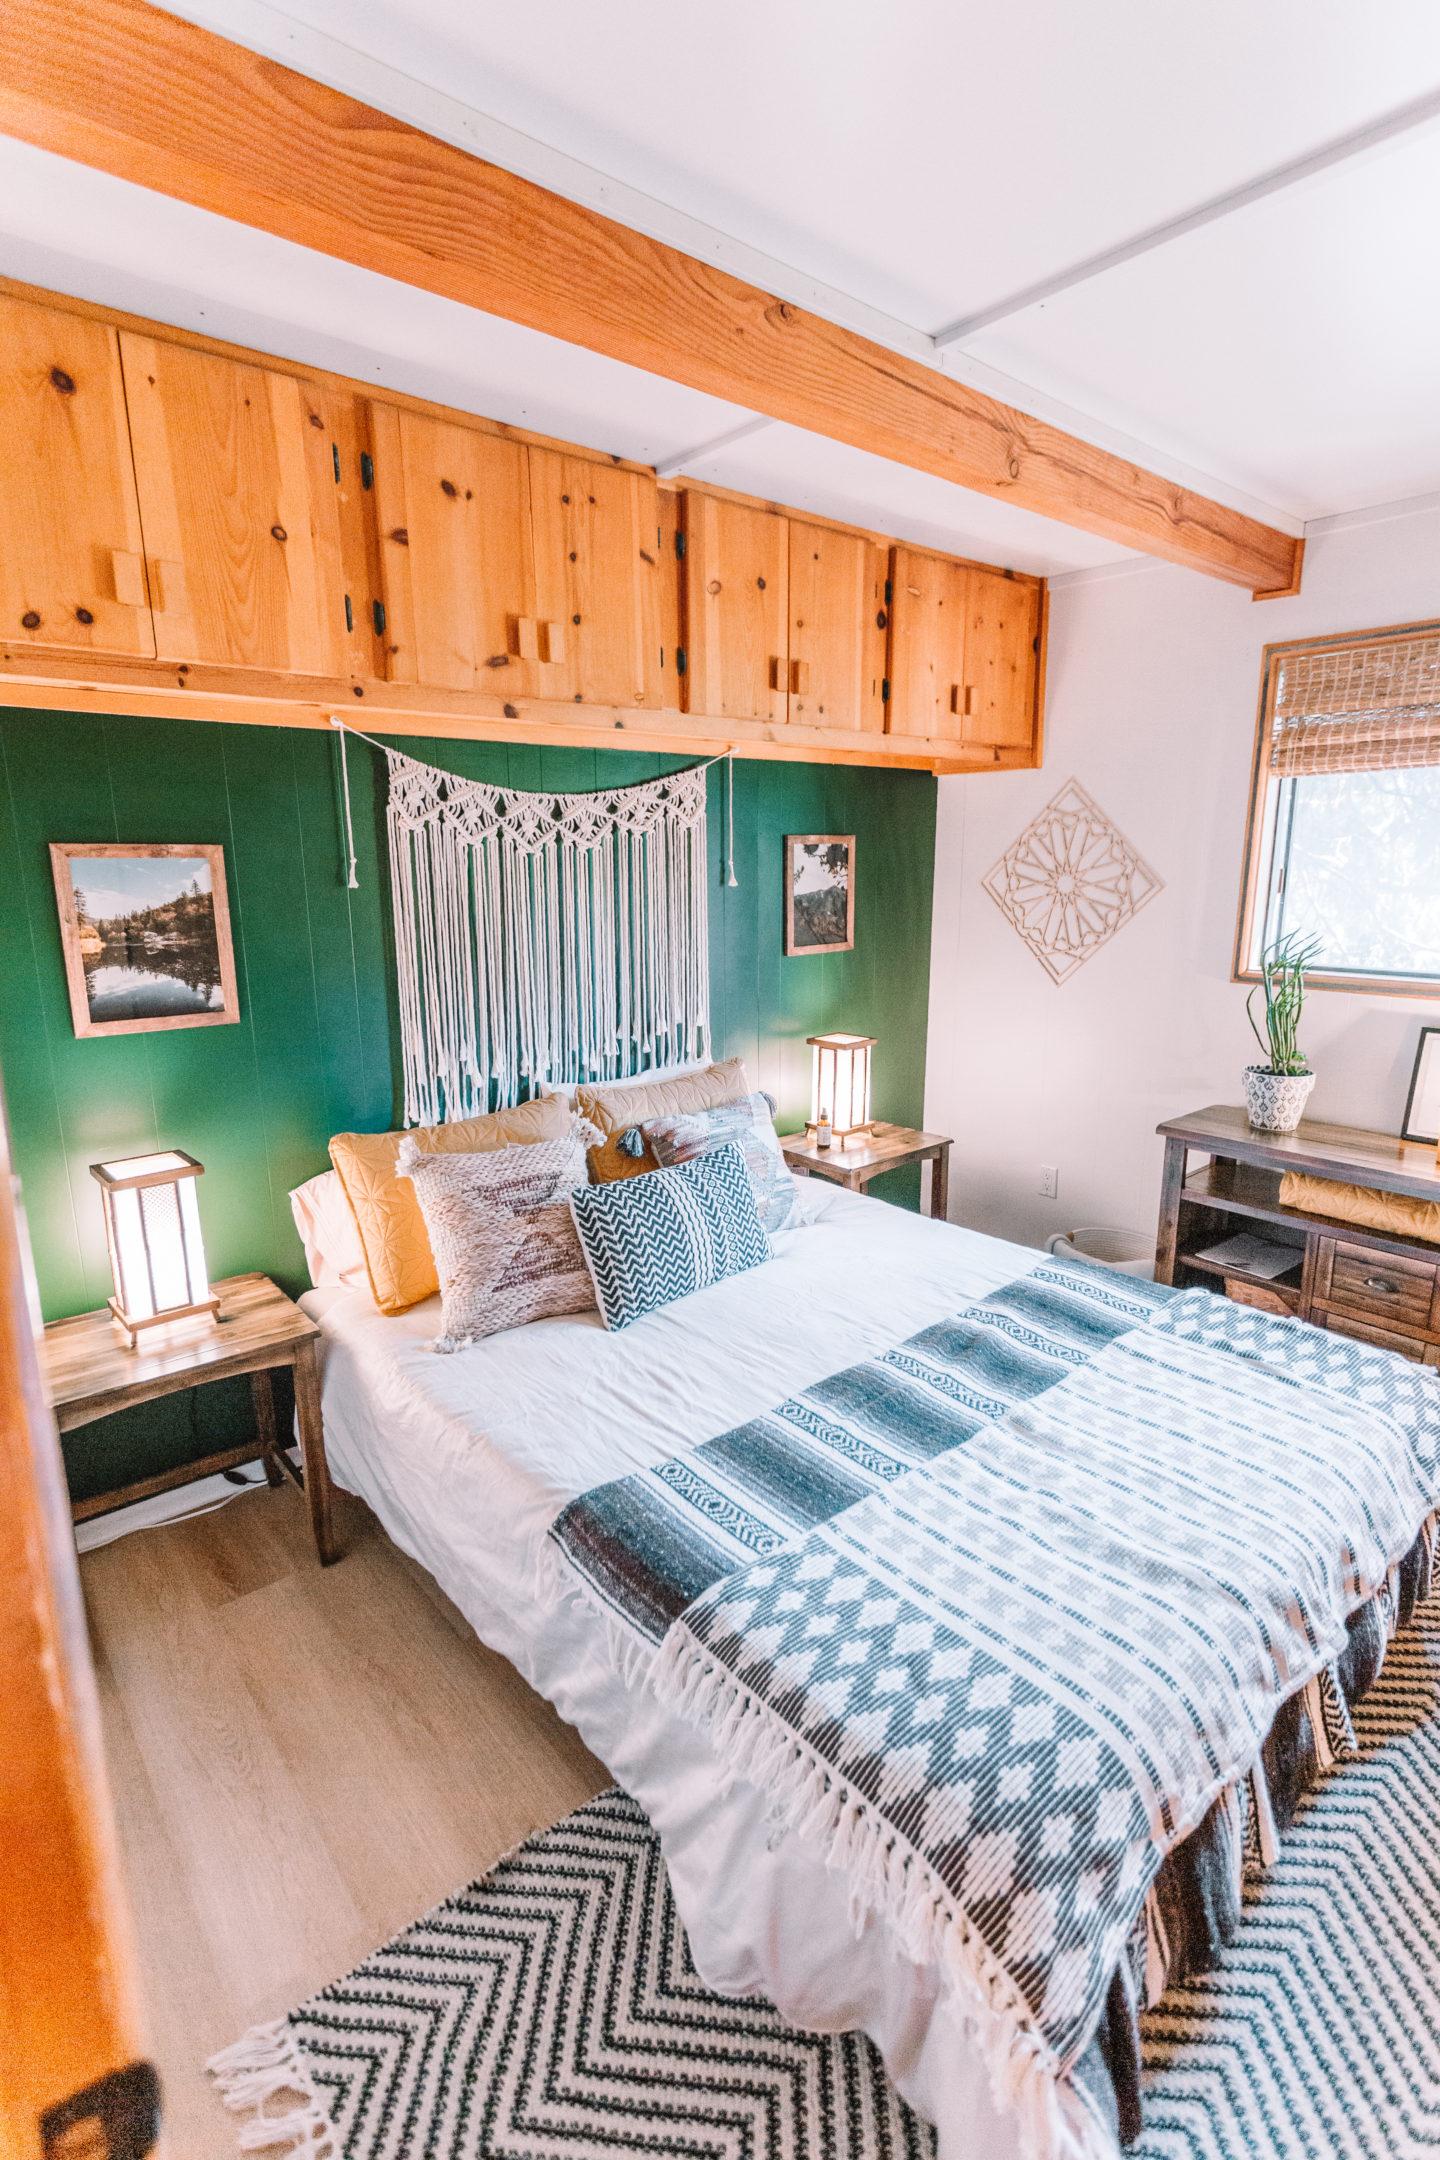 Whiskey Creek Cabin - Idyllwild Airbnb // wanderabode.com